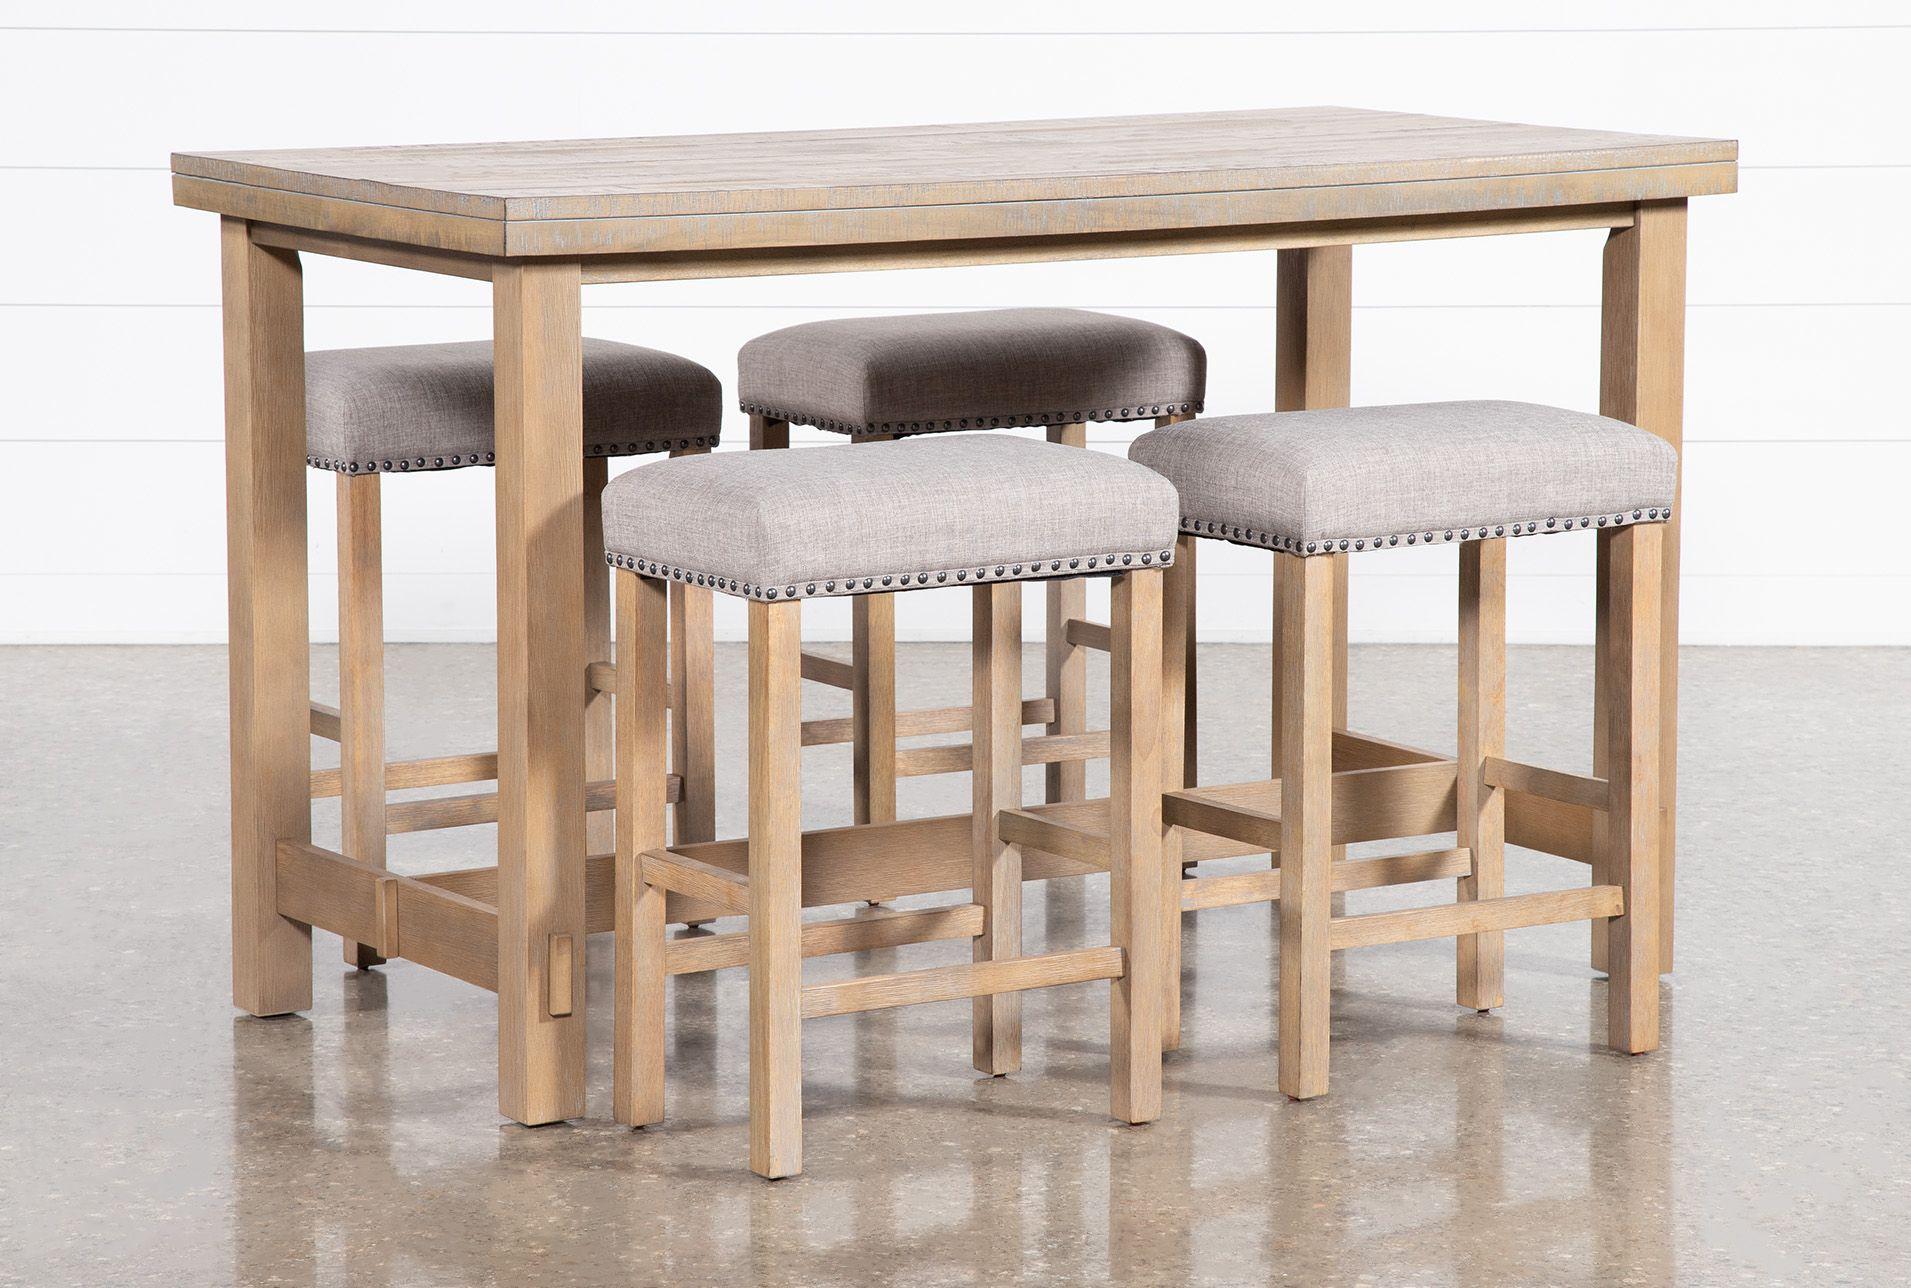 Fairview 5 Piece Counter Set Natural Wood 19 W X 12 5 D X